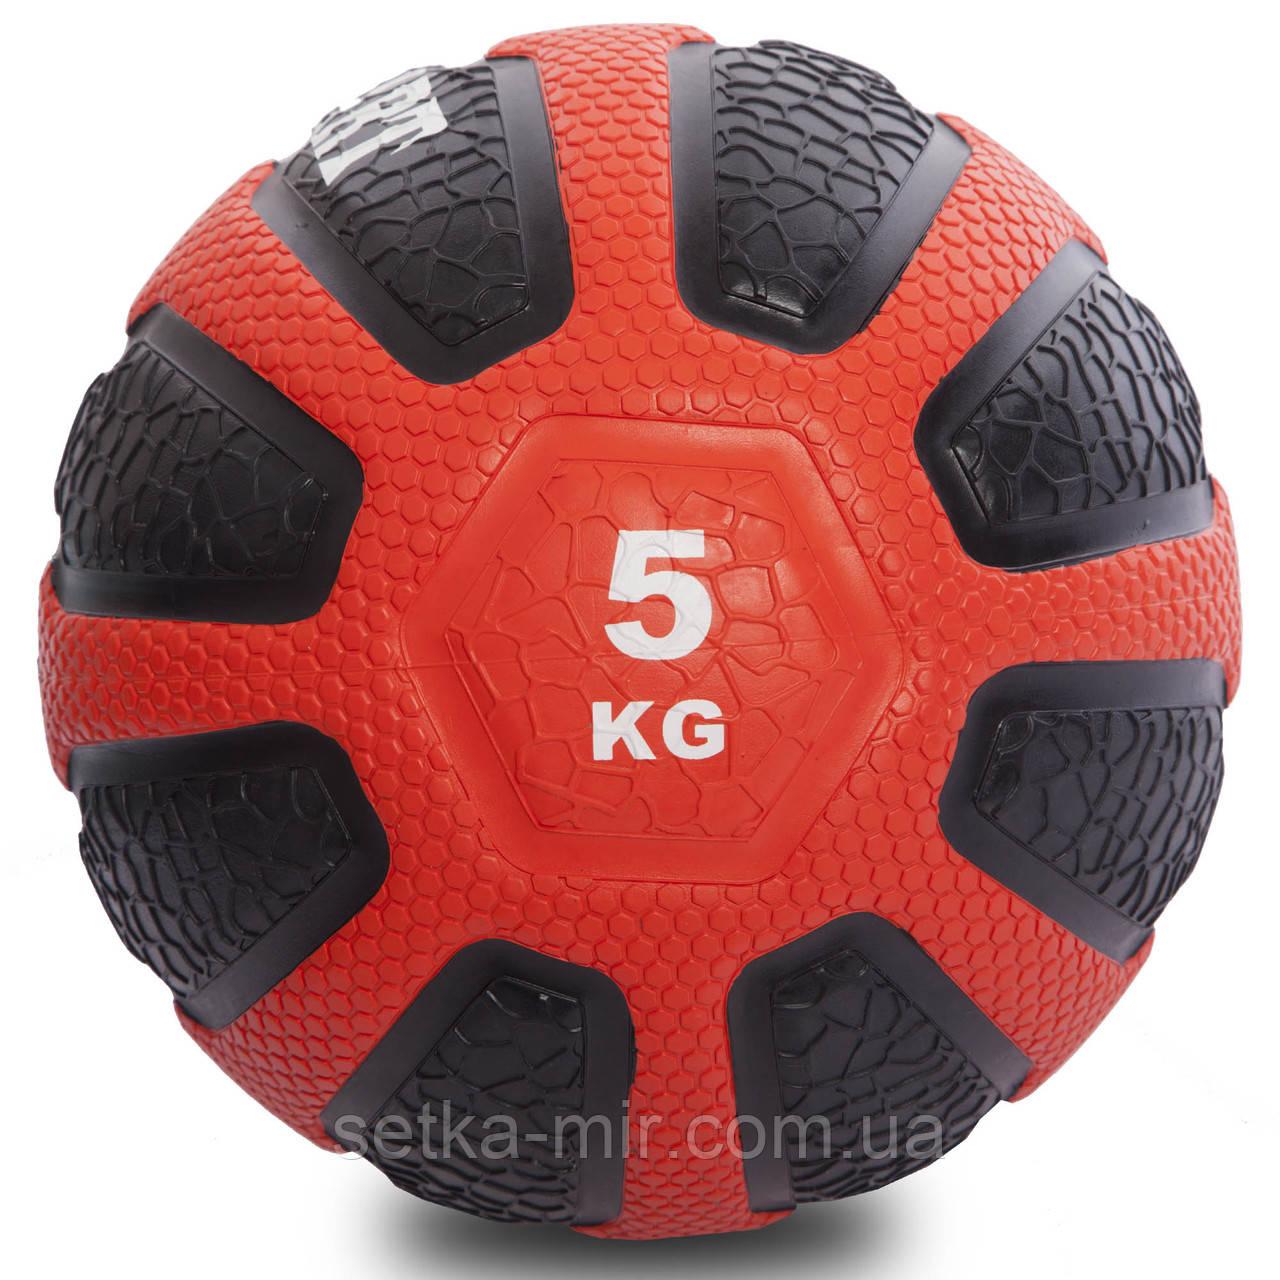 М'яч медичний медбол Zelart Medicine Ball FI-0898-5 5кг